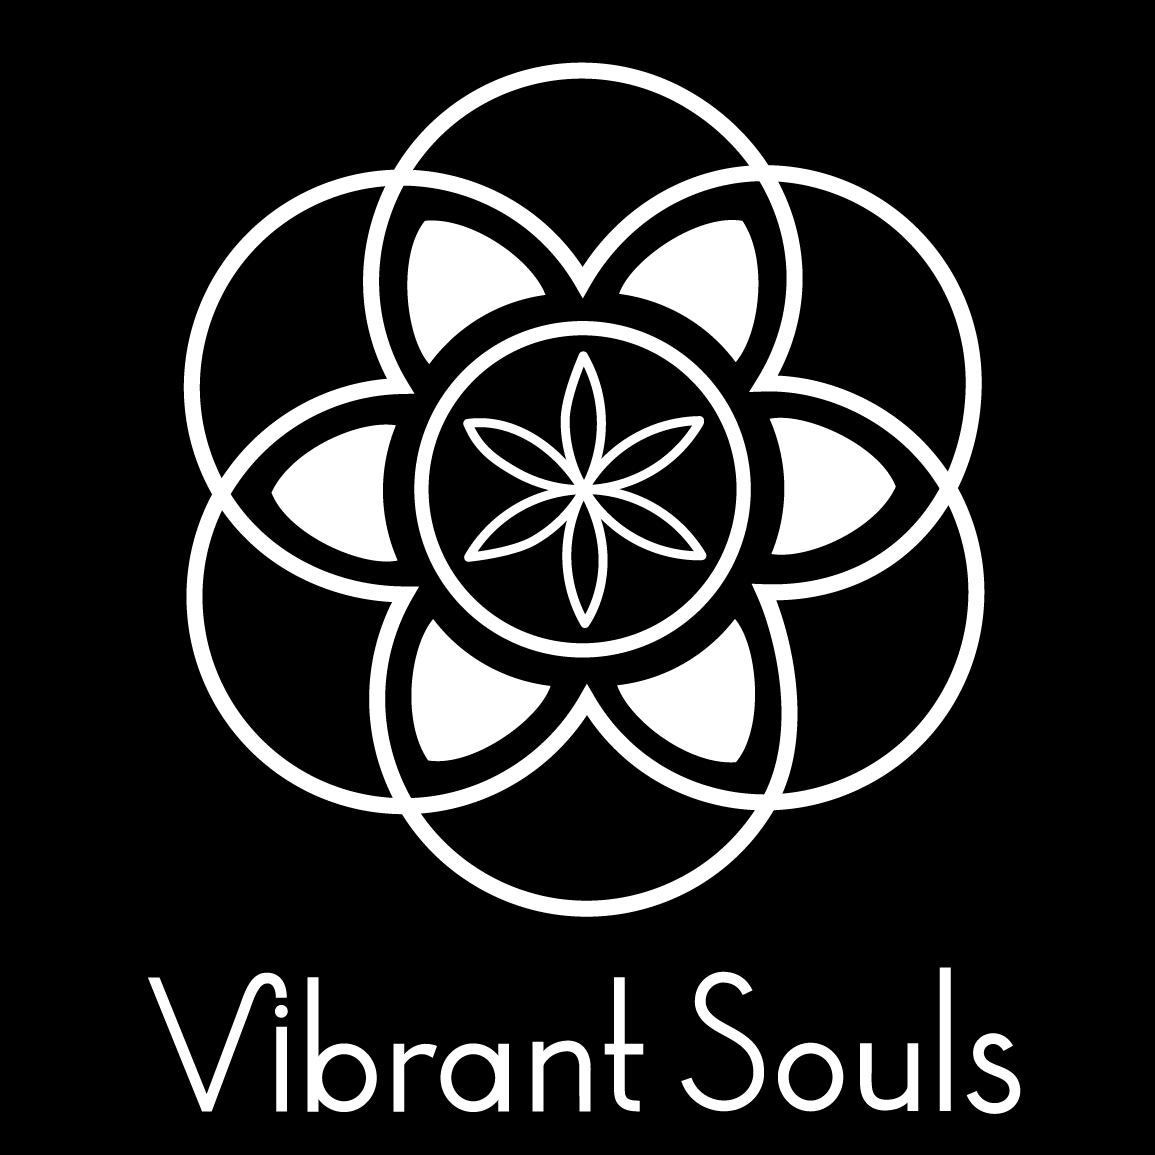 Vibrant-Souls-Logo_bigicon_white.png